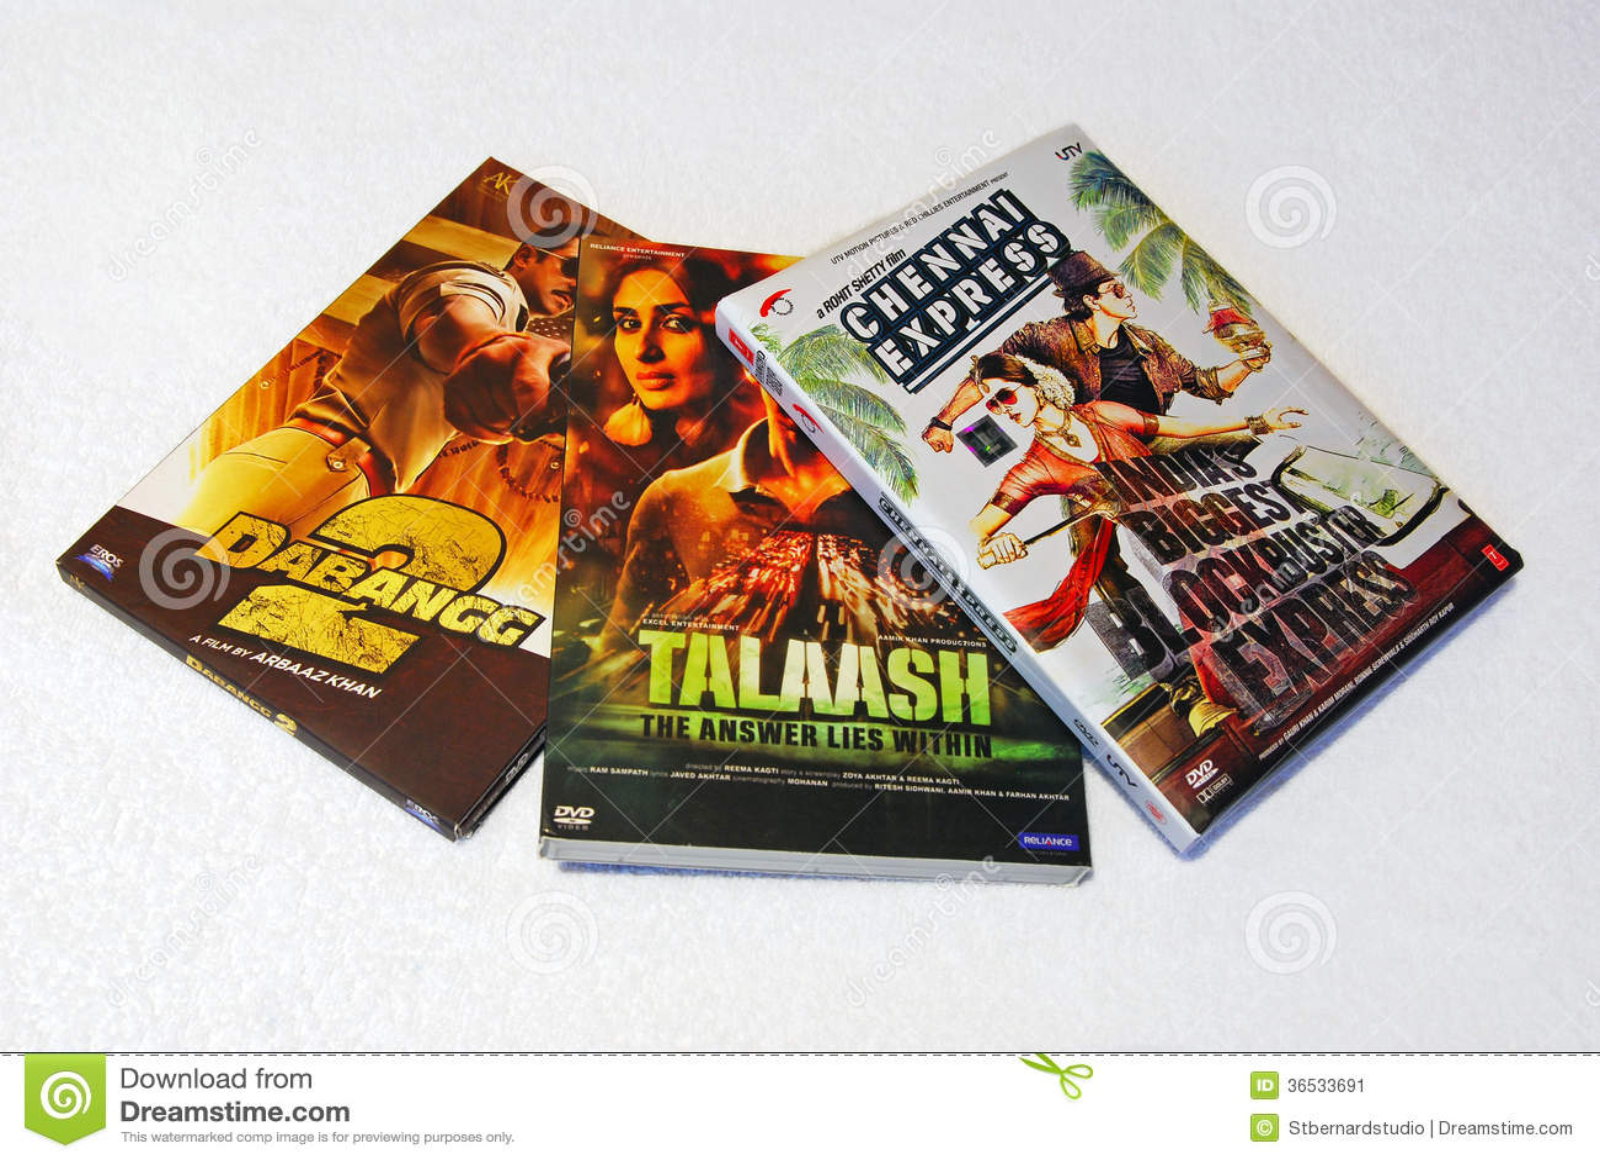 Hindi Movie DVD